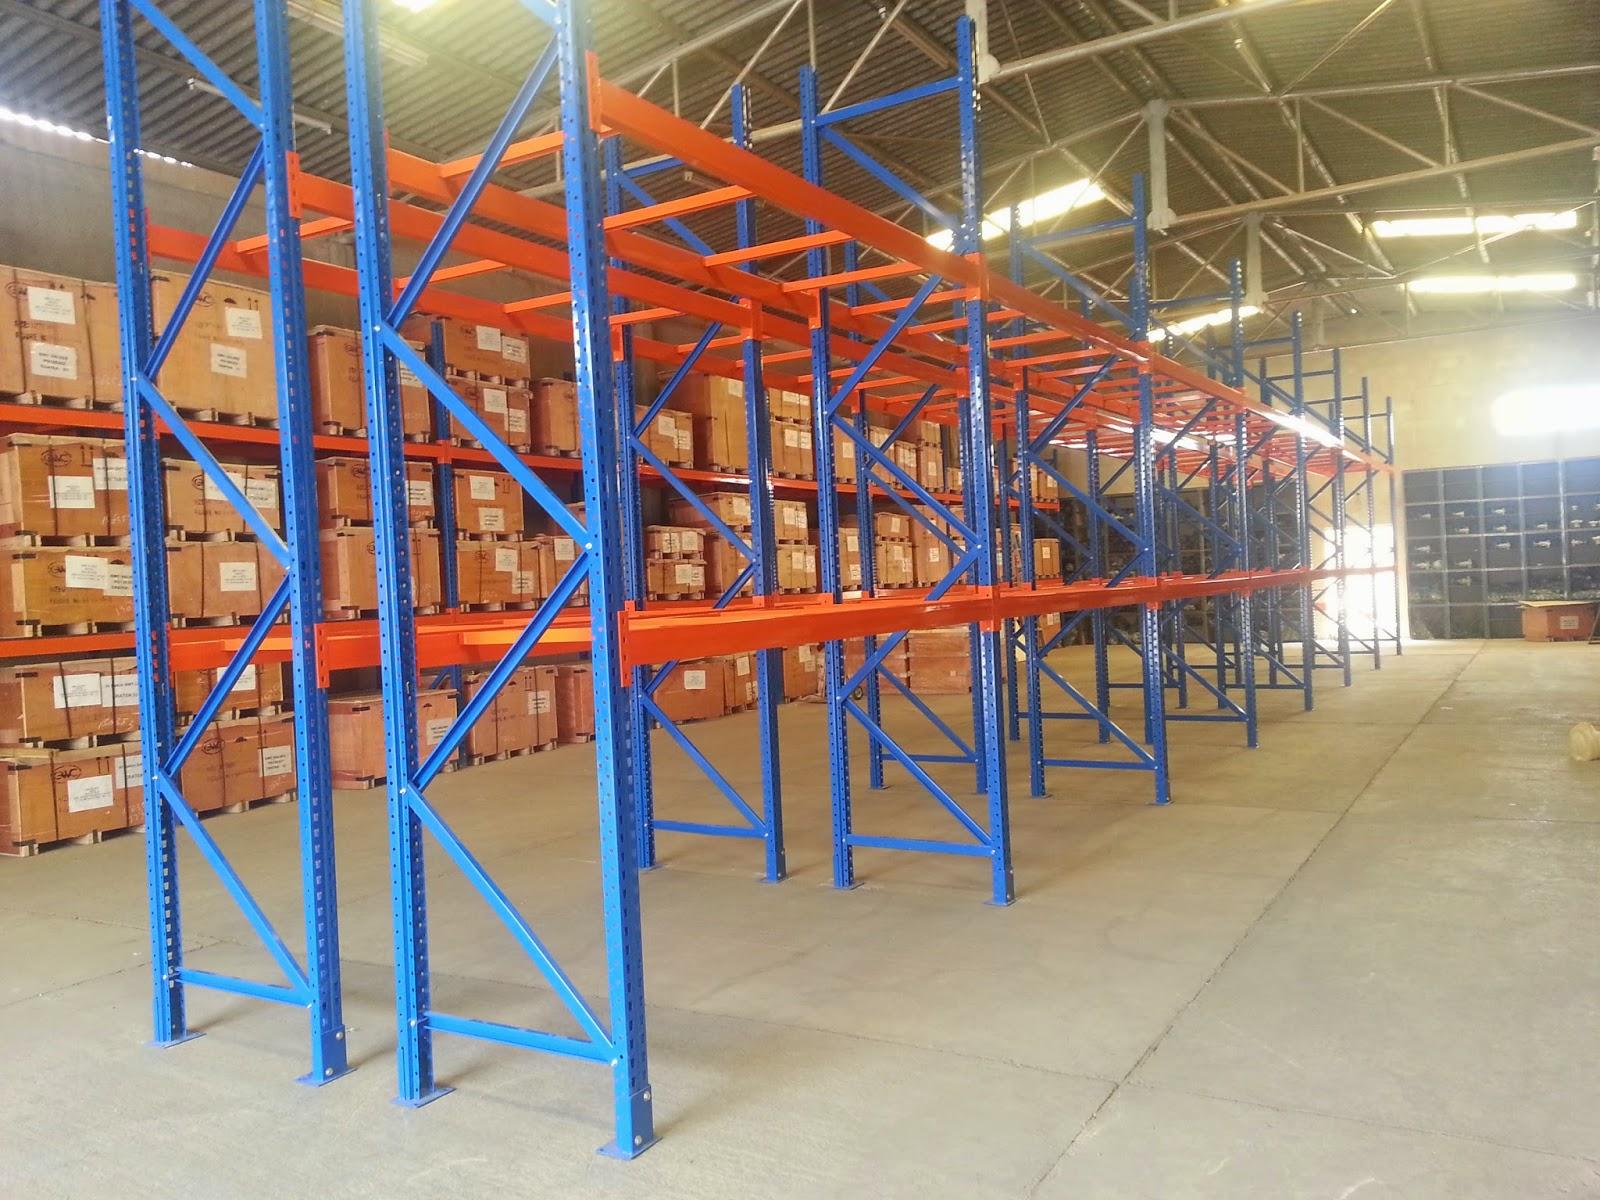 Storage Racking Uae Warehouse Shelving In Dubai Racking Systems For High Loads Warehouse